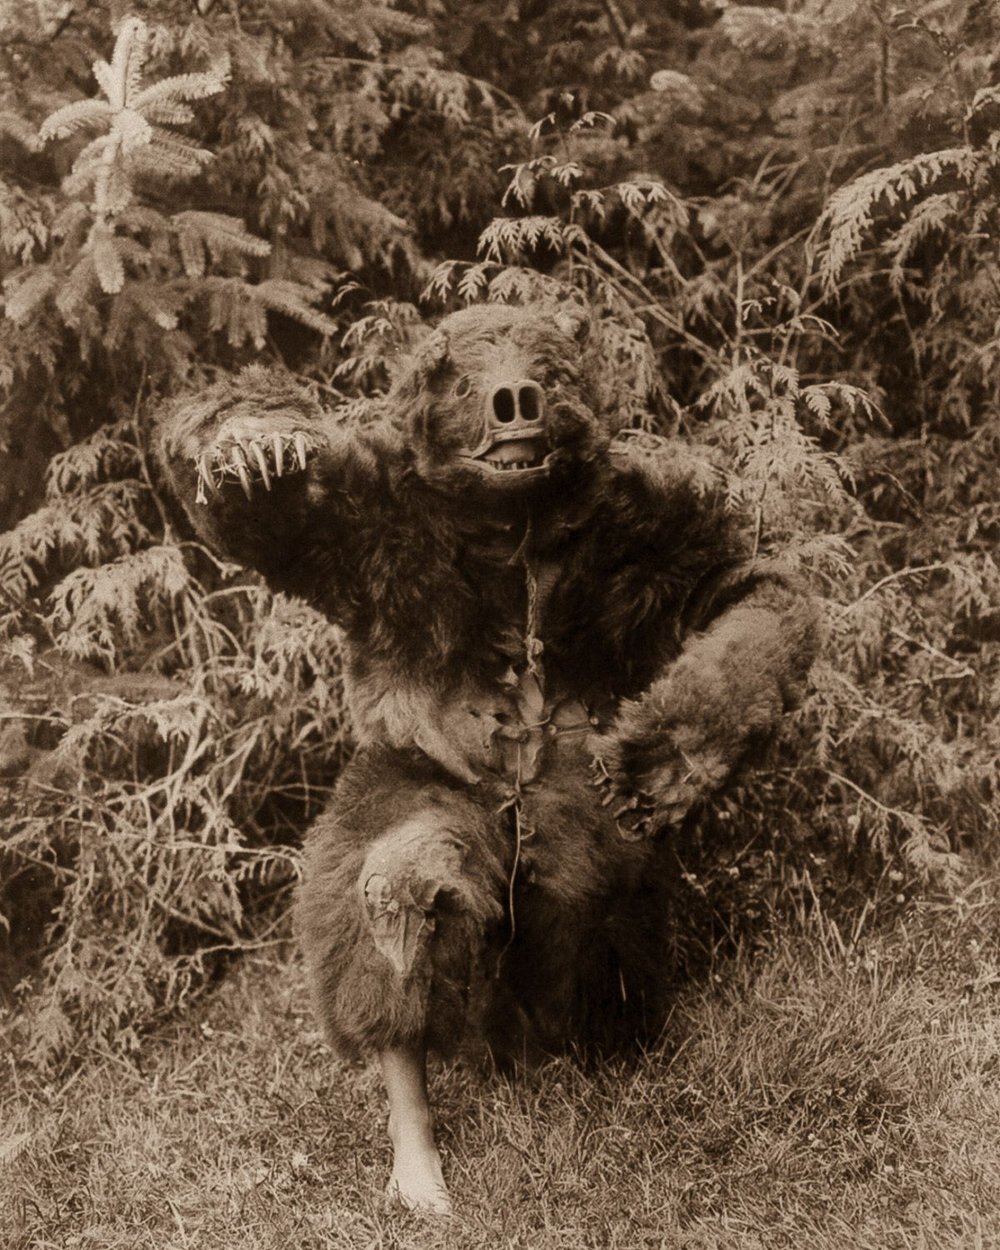 A Qagyuhl man dressed as a bear,  1914.  ©EDWARD S. CURTIS/LIBRARY OF CONGRESS